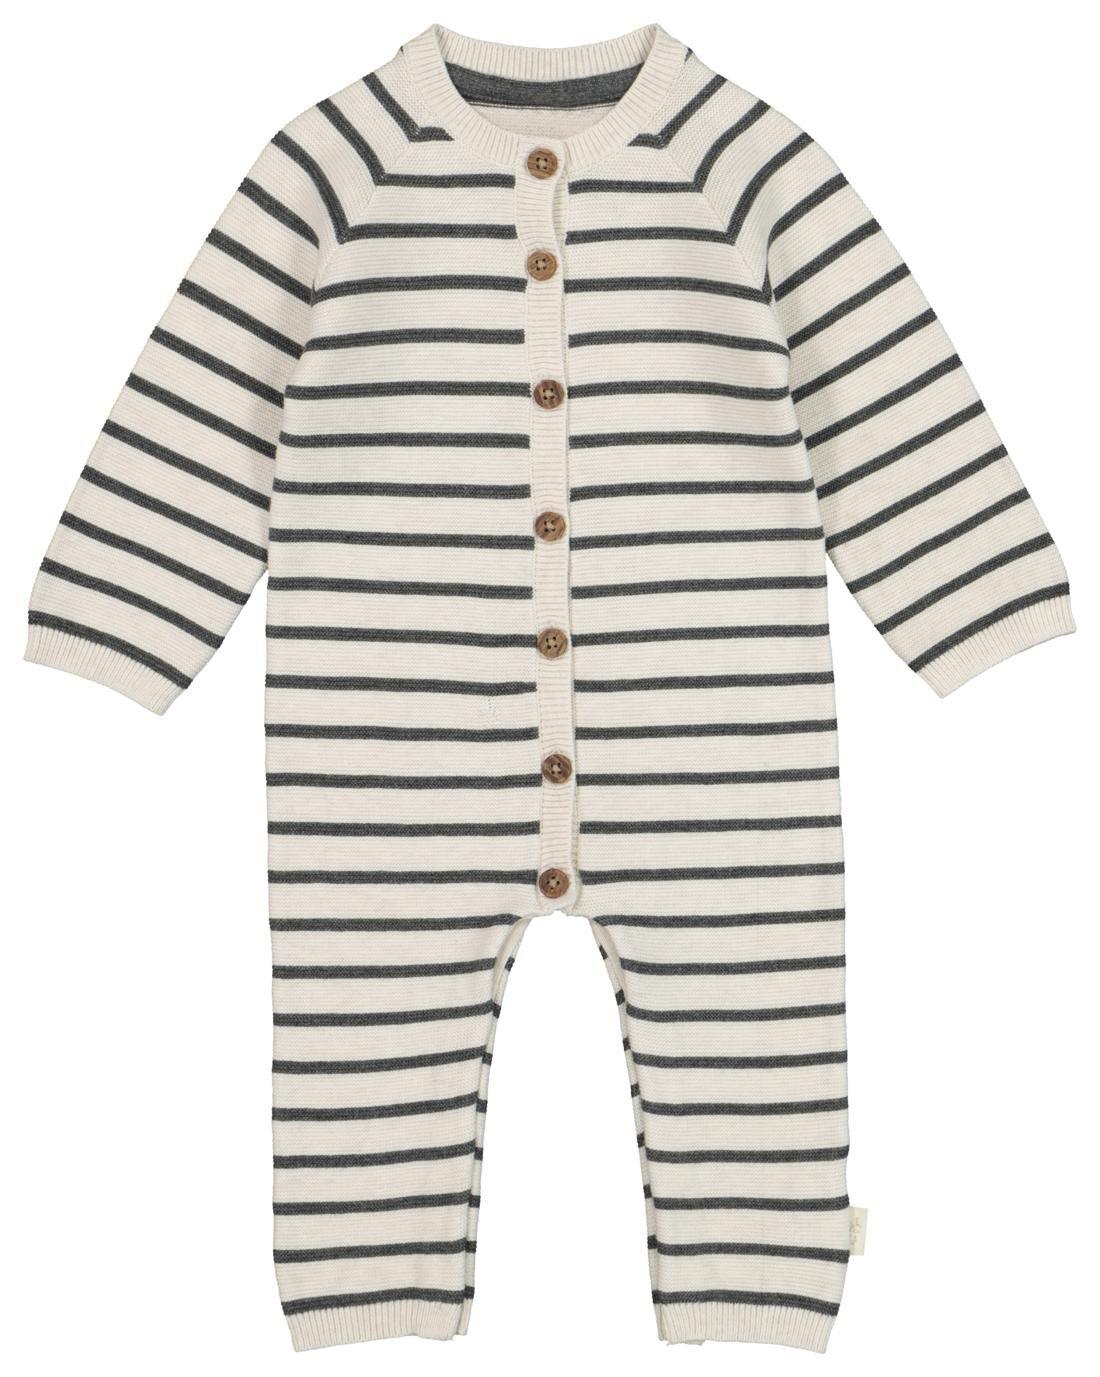 HEMA Newborn Jumpsuit Organic Katoen Gebreid Grijs